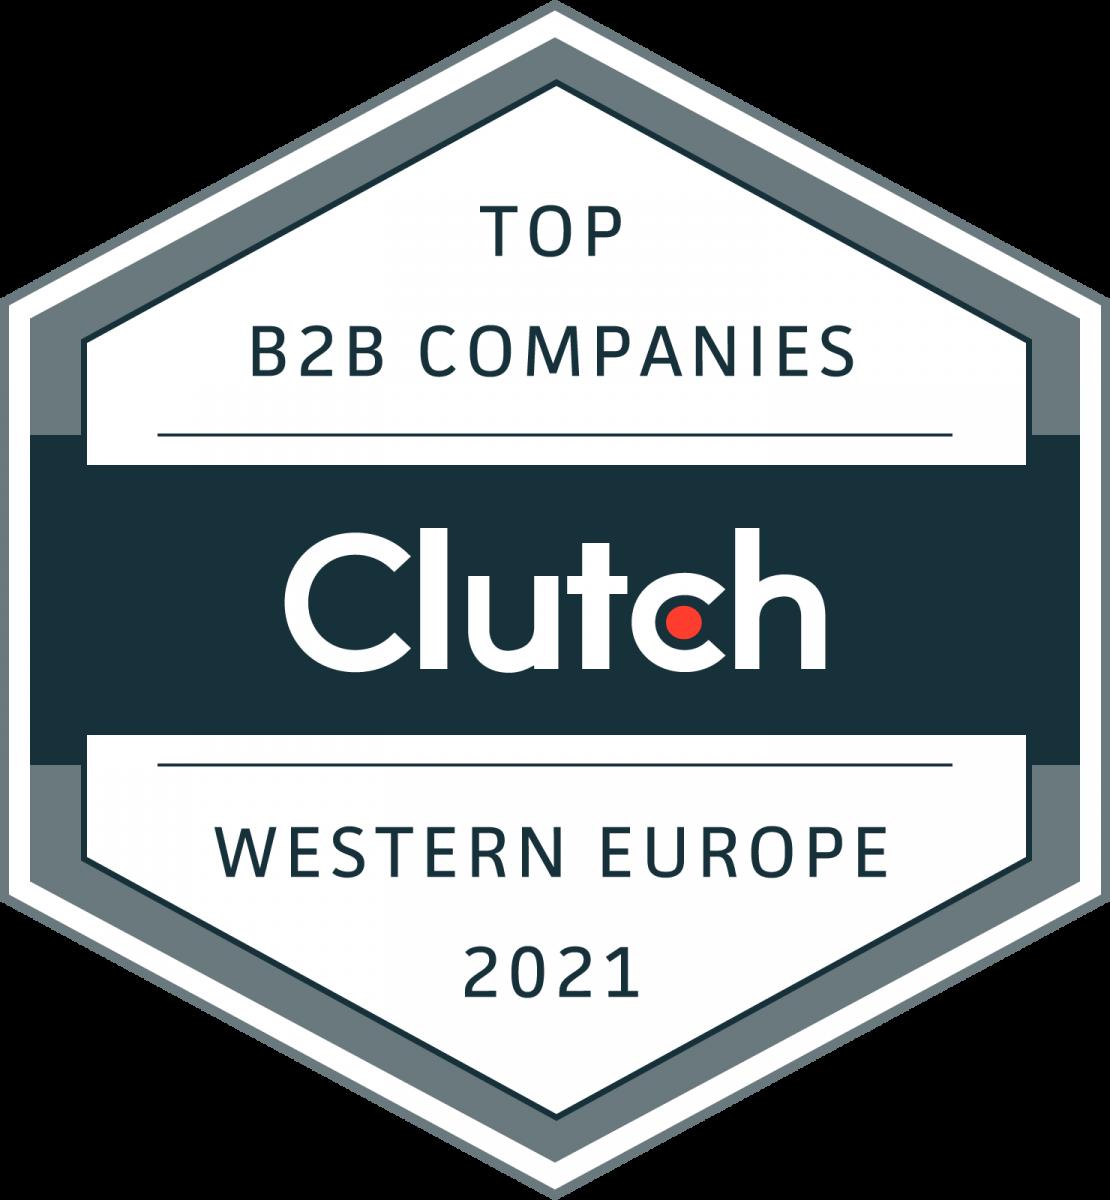 Top B2B Companies Western Europe